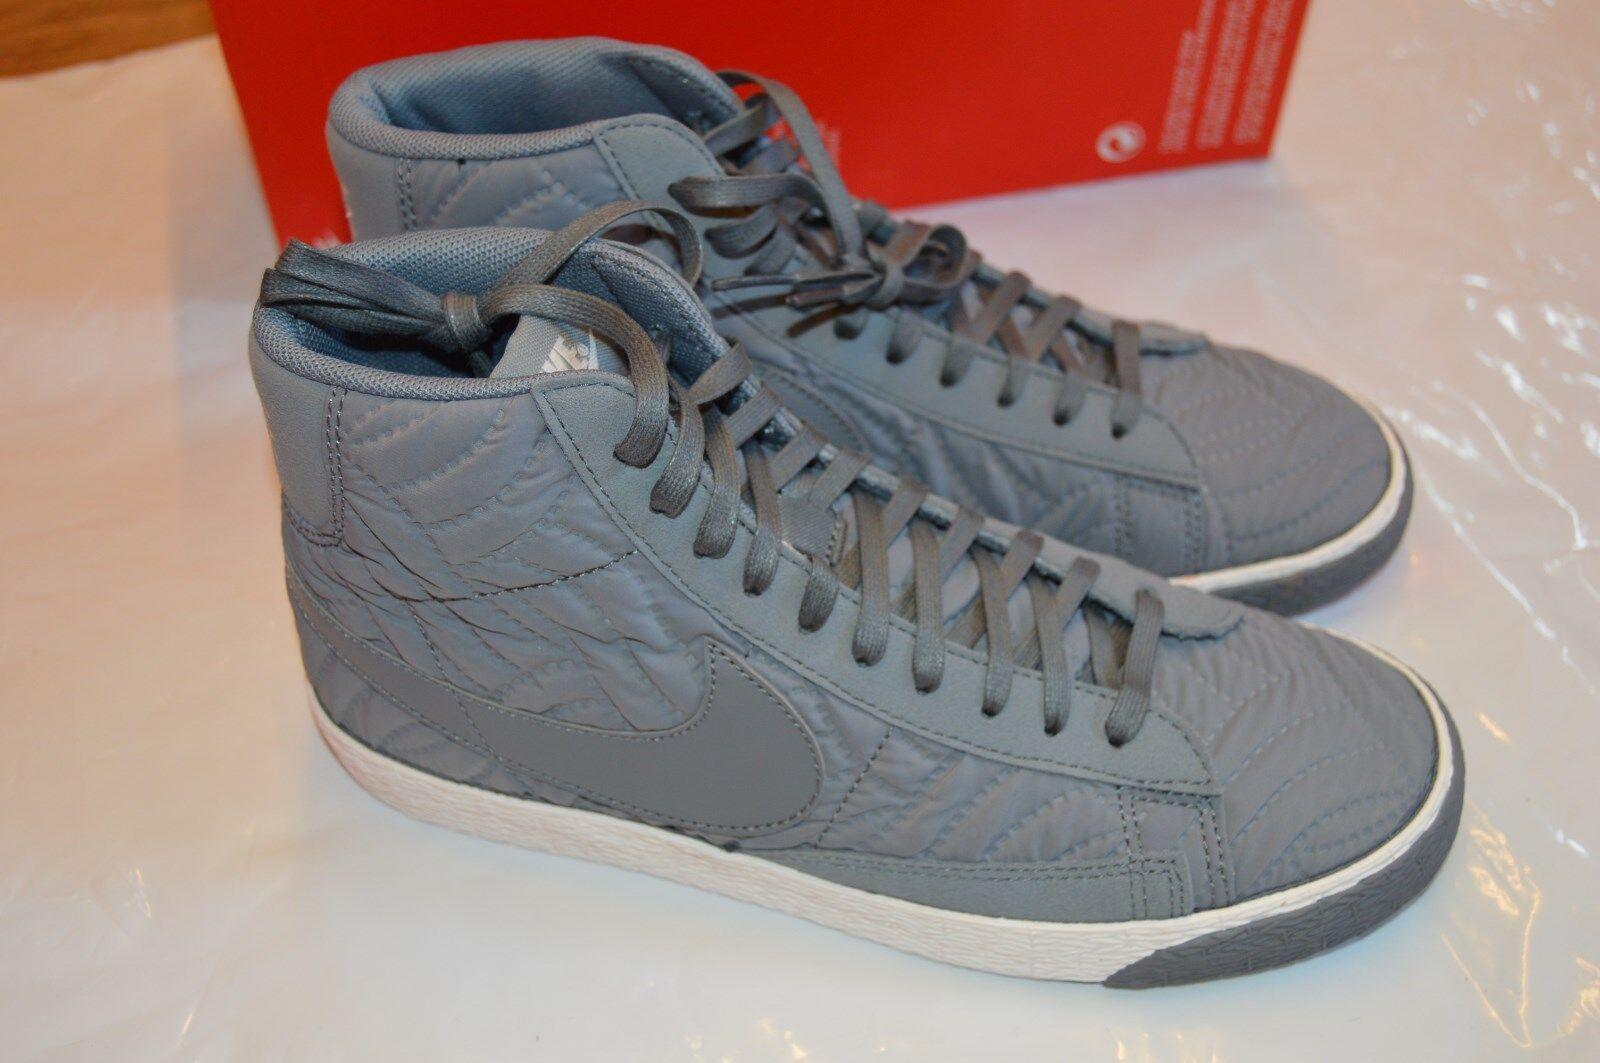 bnib Damens's Nike Blazer Mid PRM SE Grau/WEISS traines Größe UK 4 EUR 37.5